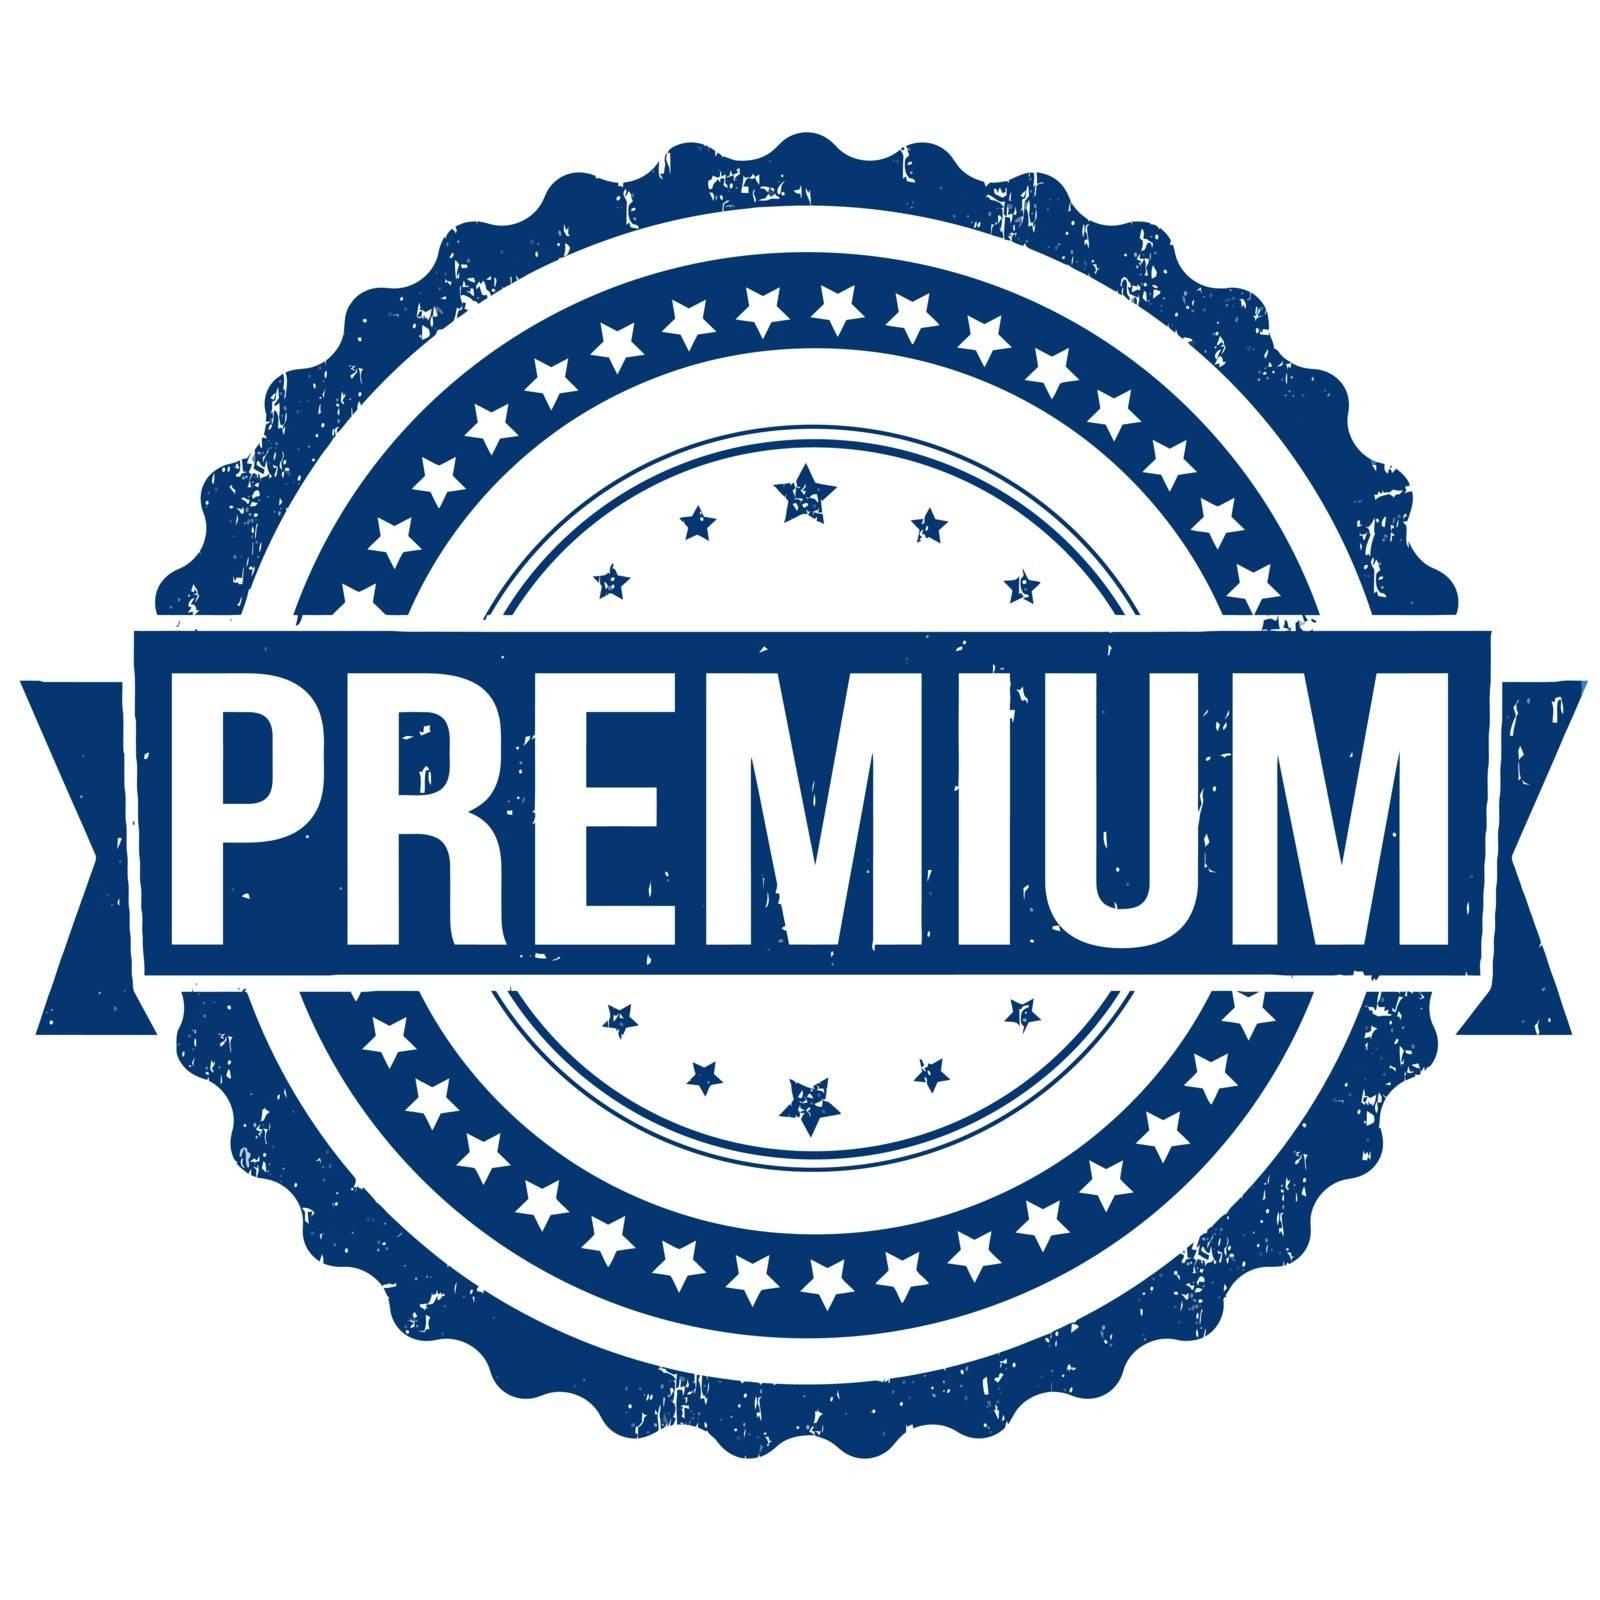 Premium grunge rubber stamp on white, vector illustration